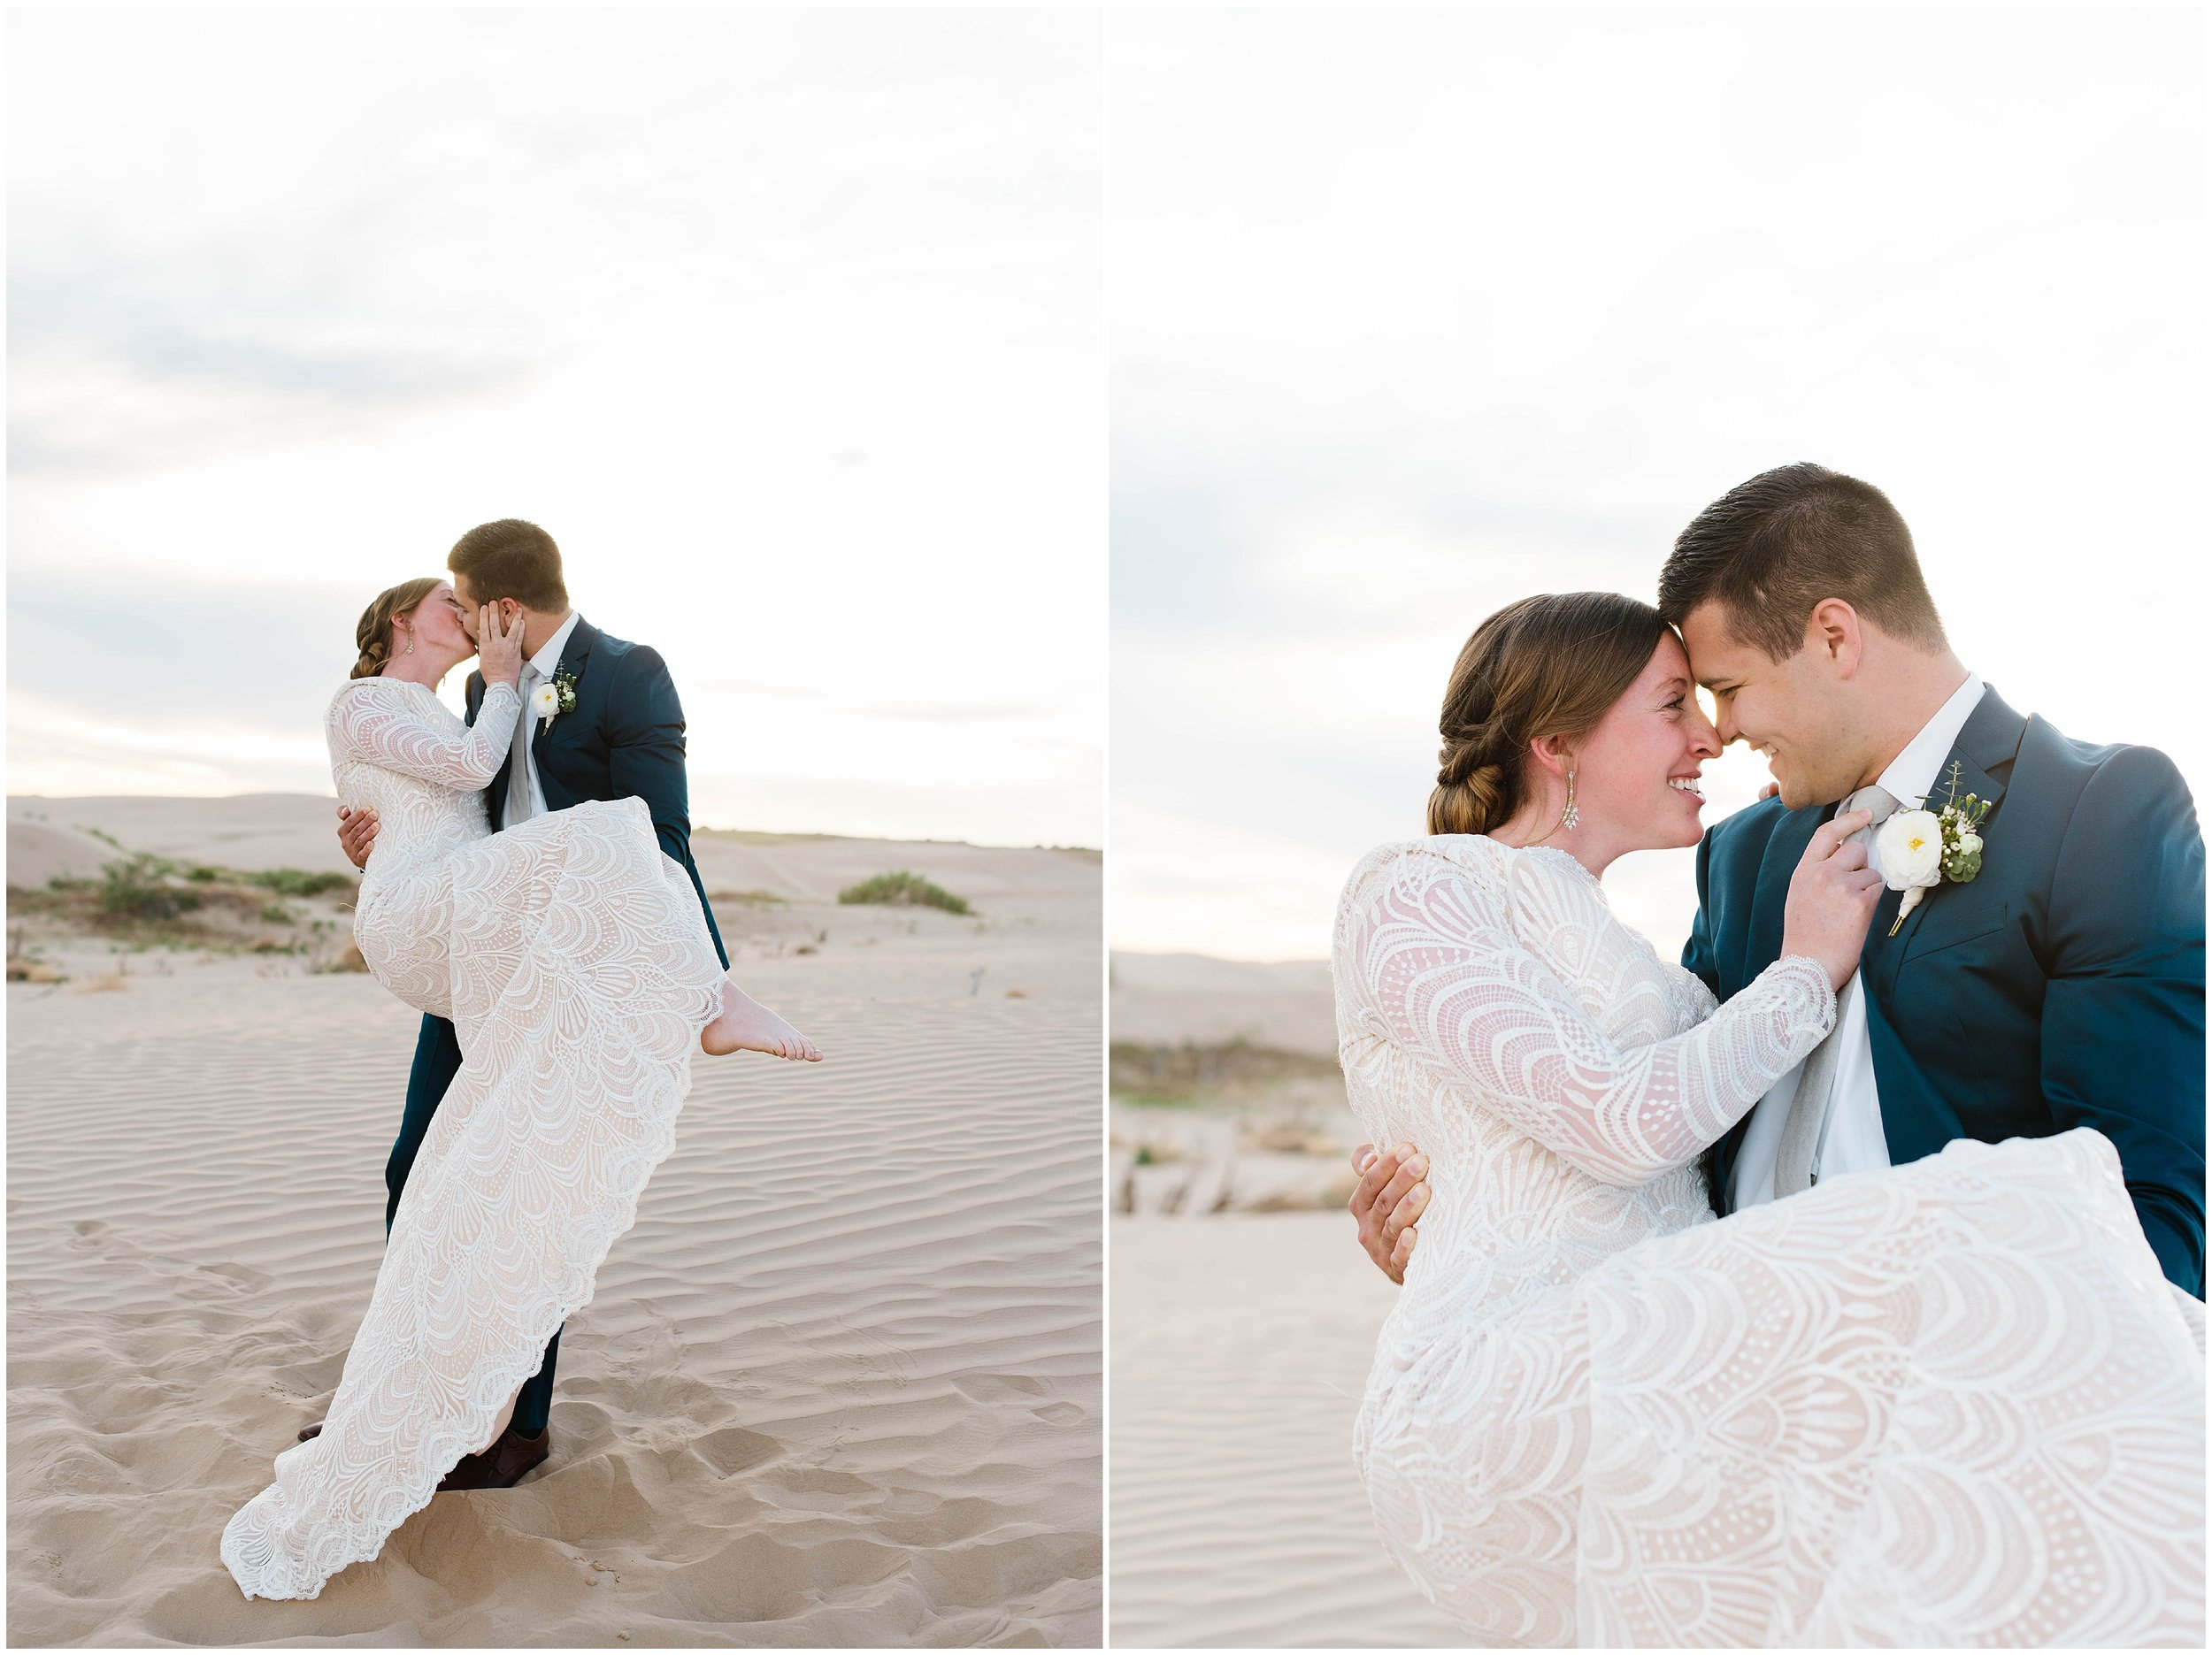 little-sahara-sand-dunes-wedding-amber-lynne-photography.jpg12.jpg